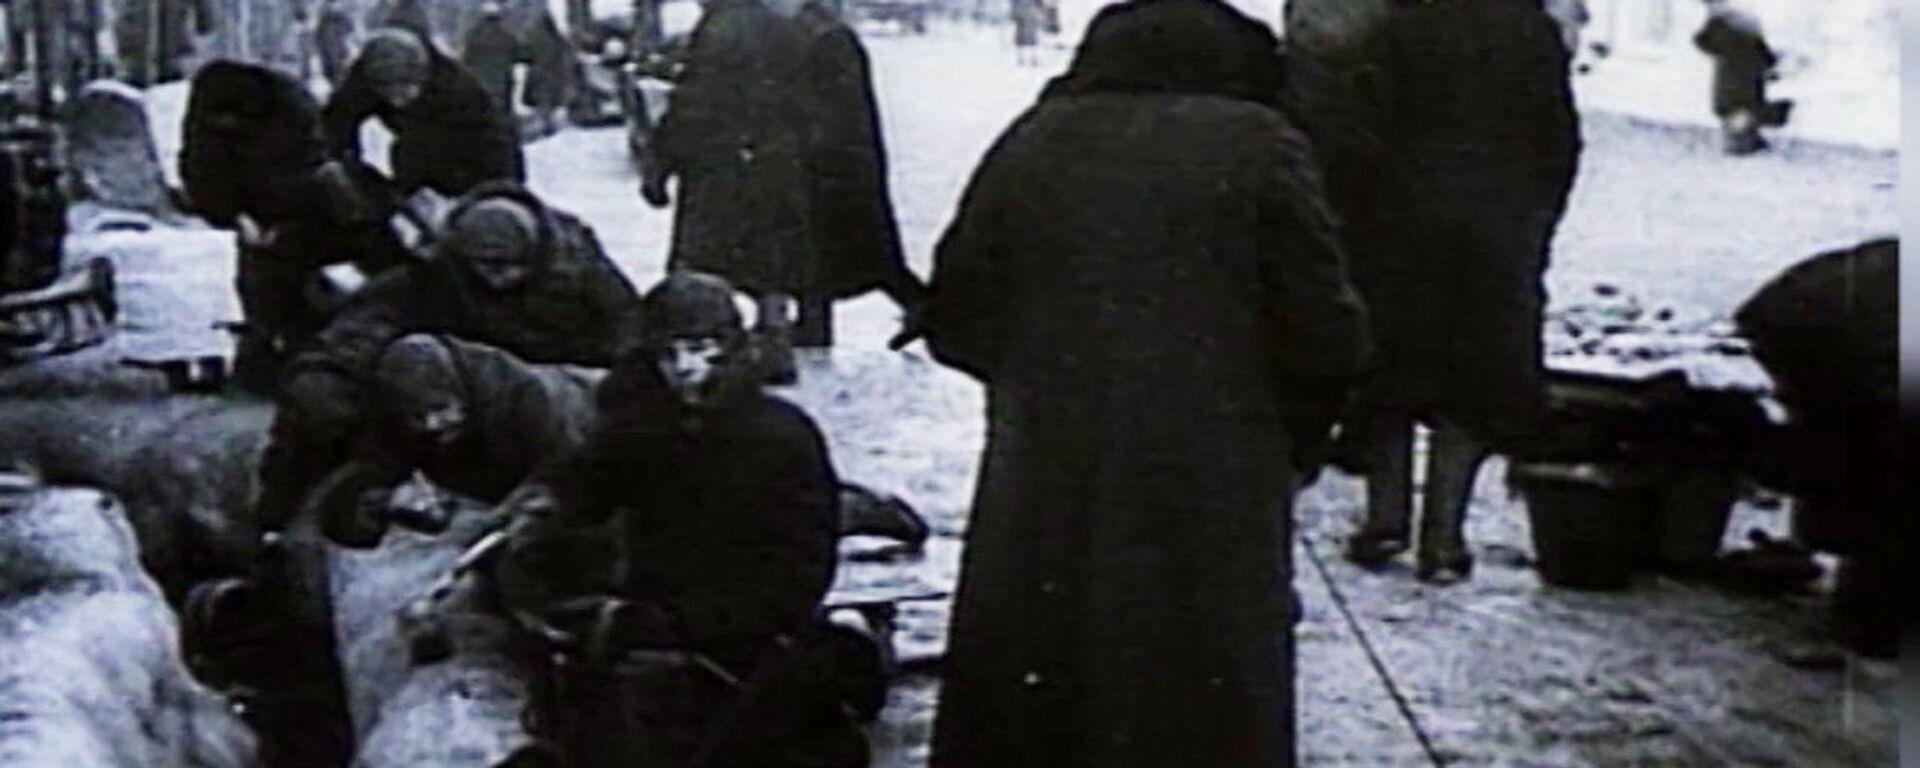 Начало блокады Ленинграда - Sputnik Узбекистан, 1920, 27.01.2021